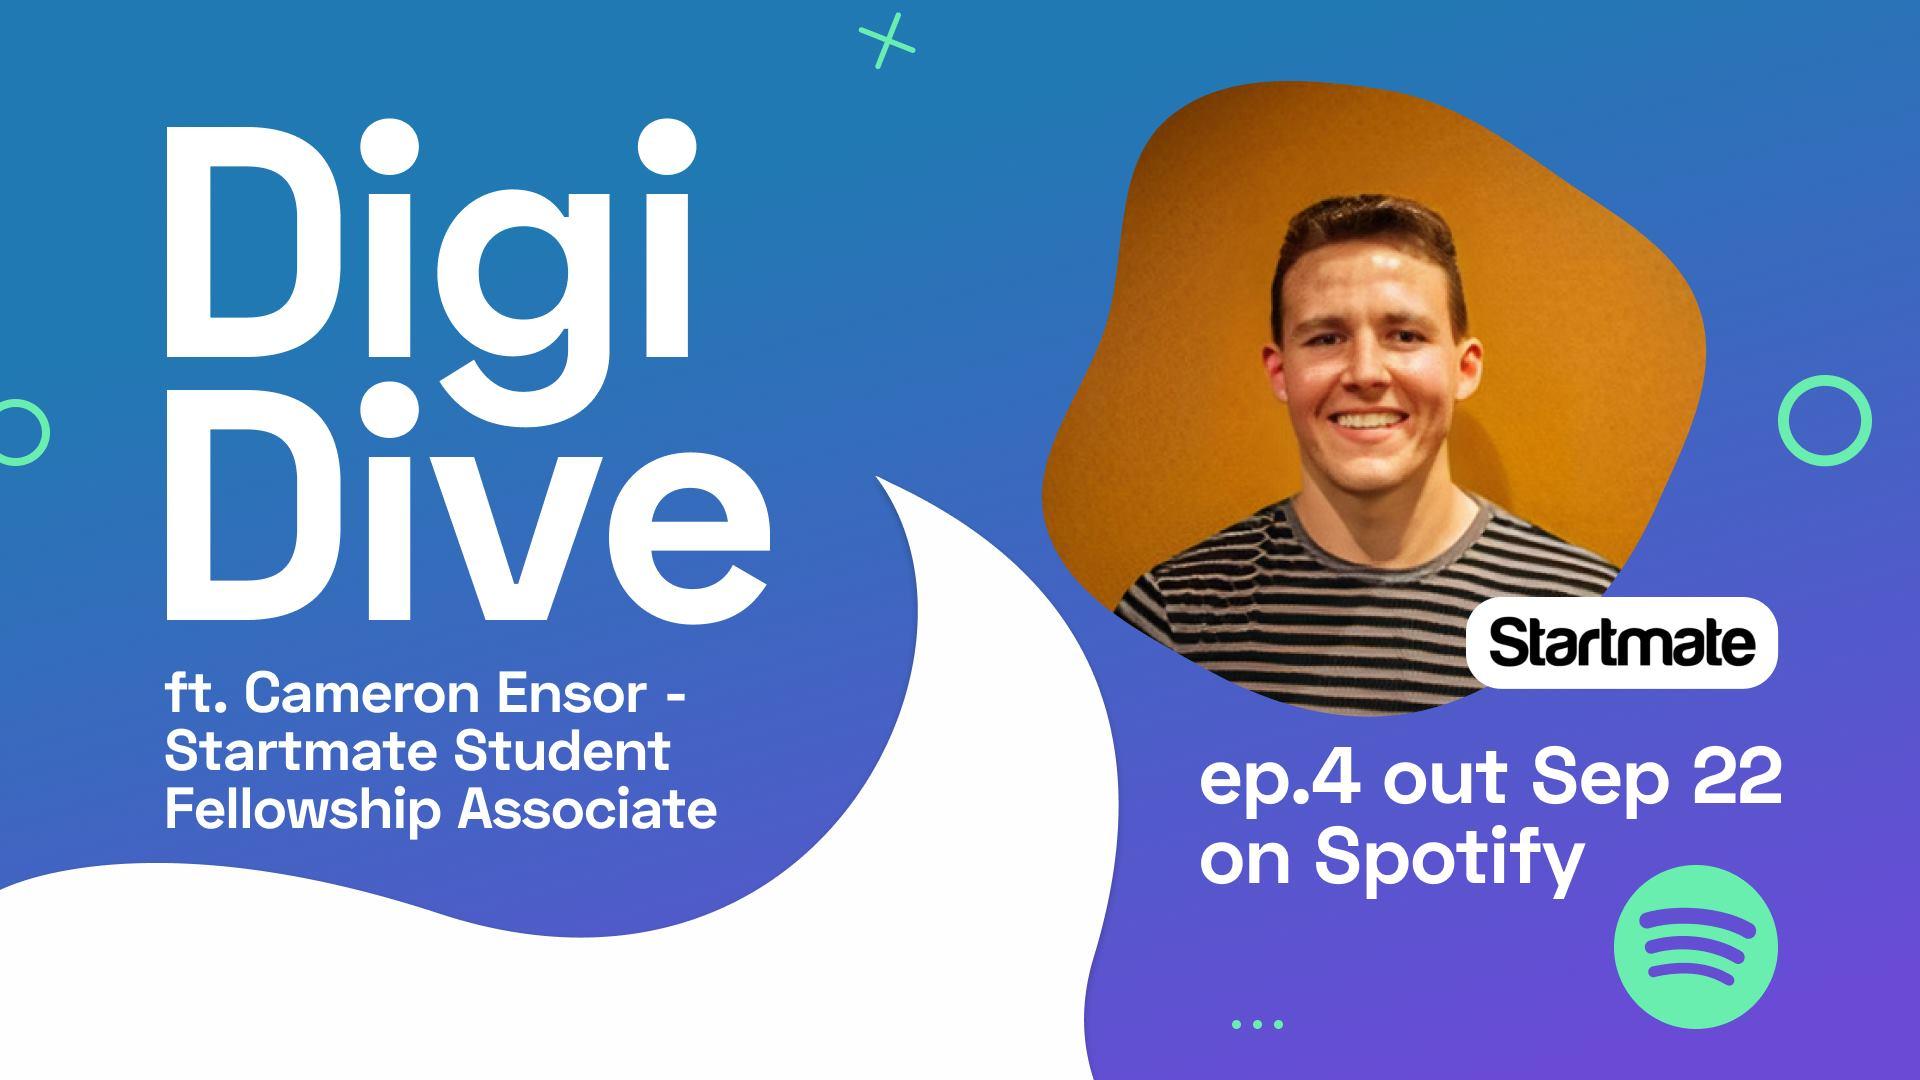 DigiDive Episode #4: Startmate Student Fellowship Associate with Cameron Ensor!